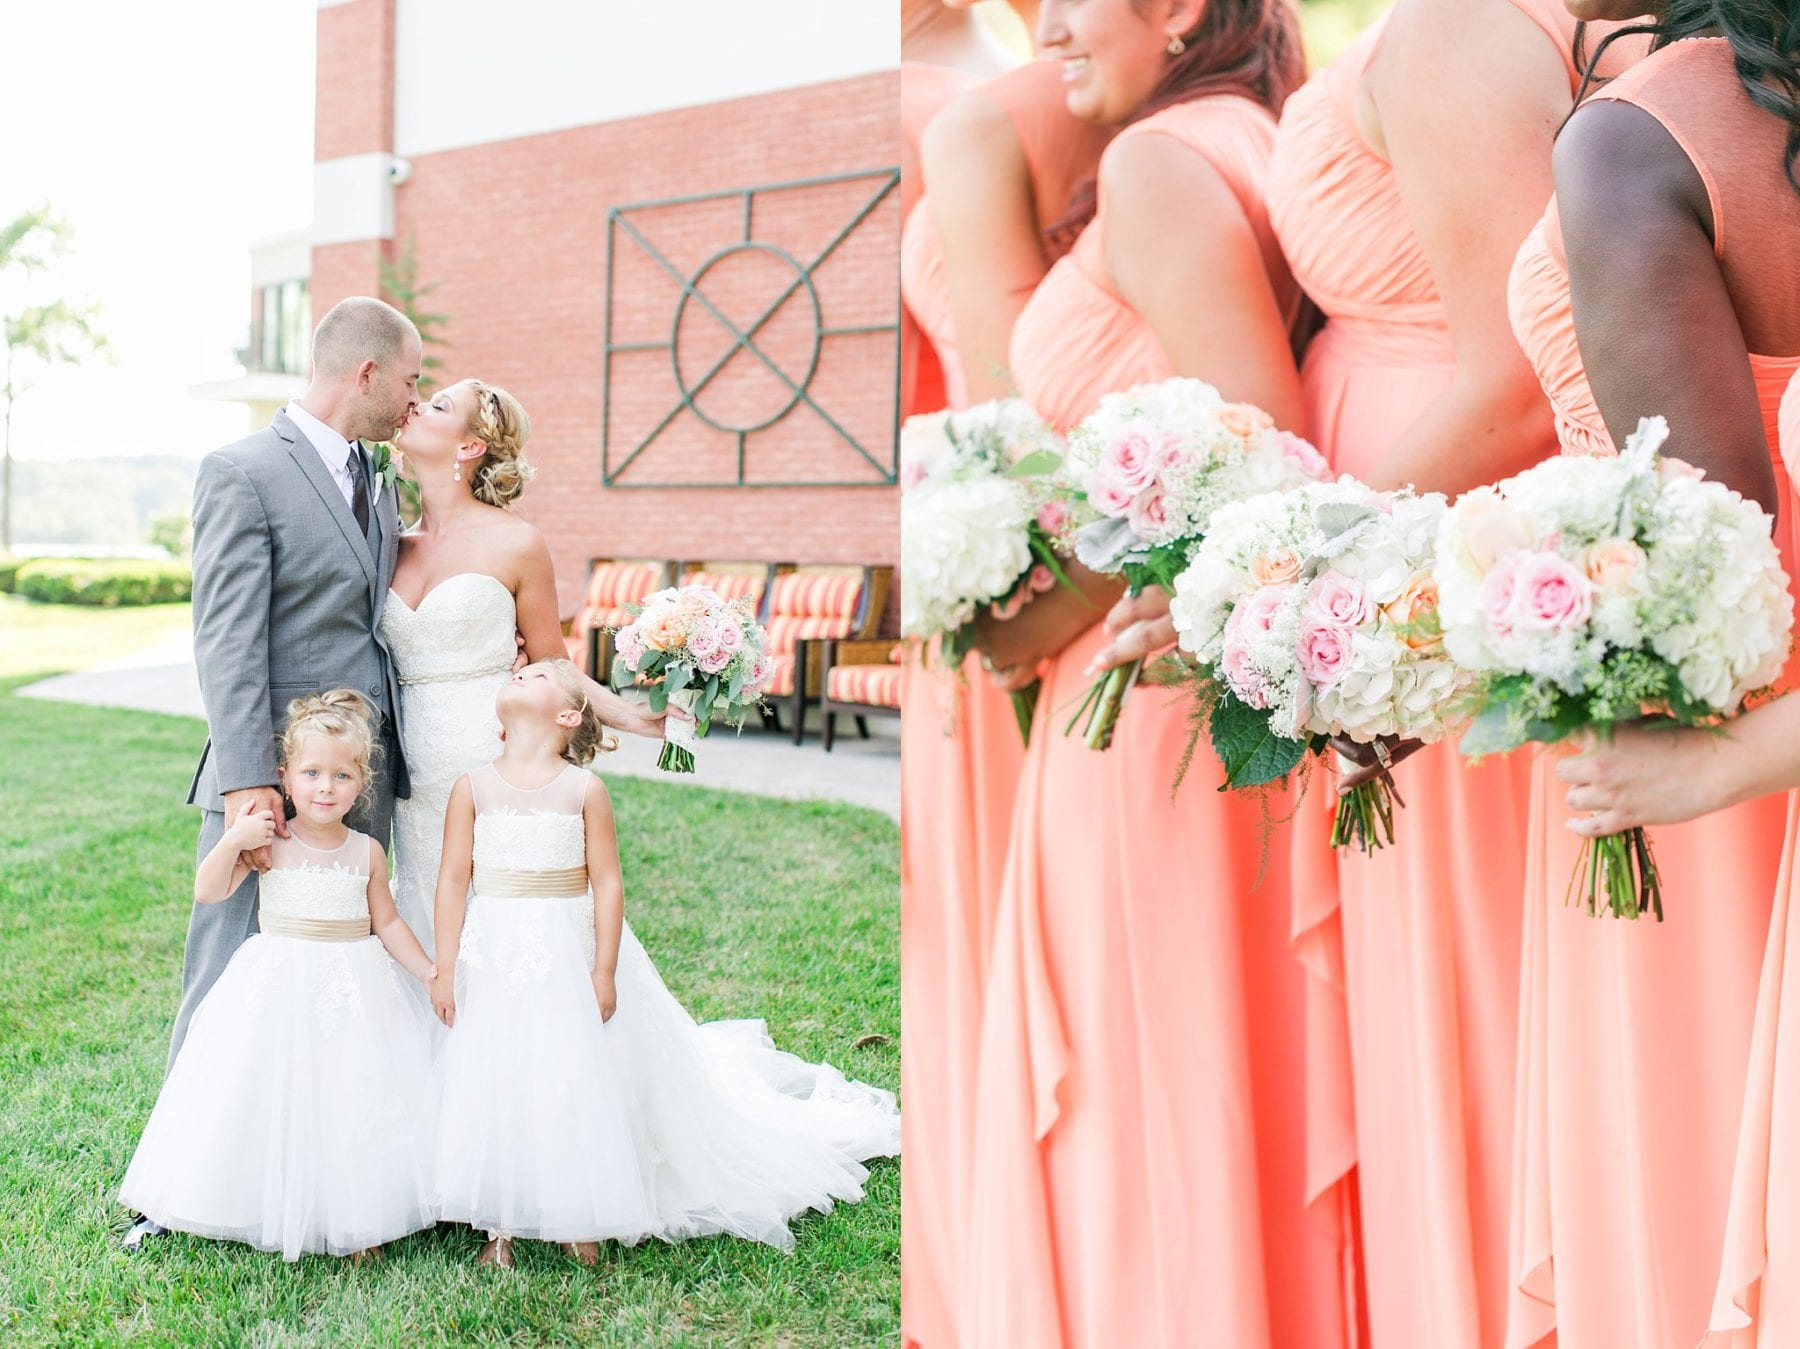 Waters Edge Wedding Photos Maryland Wedding Photographer Megan Kelsey Photography Katie & Conor-335.JPG